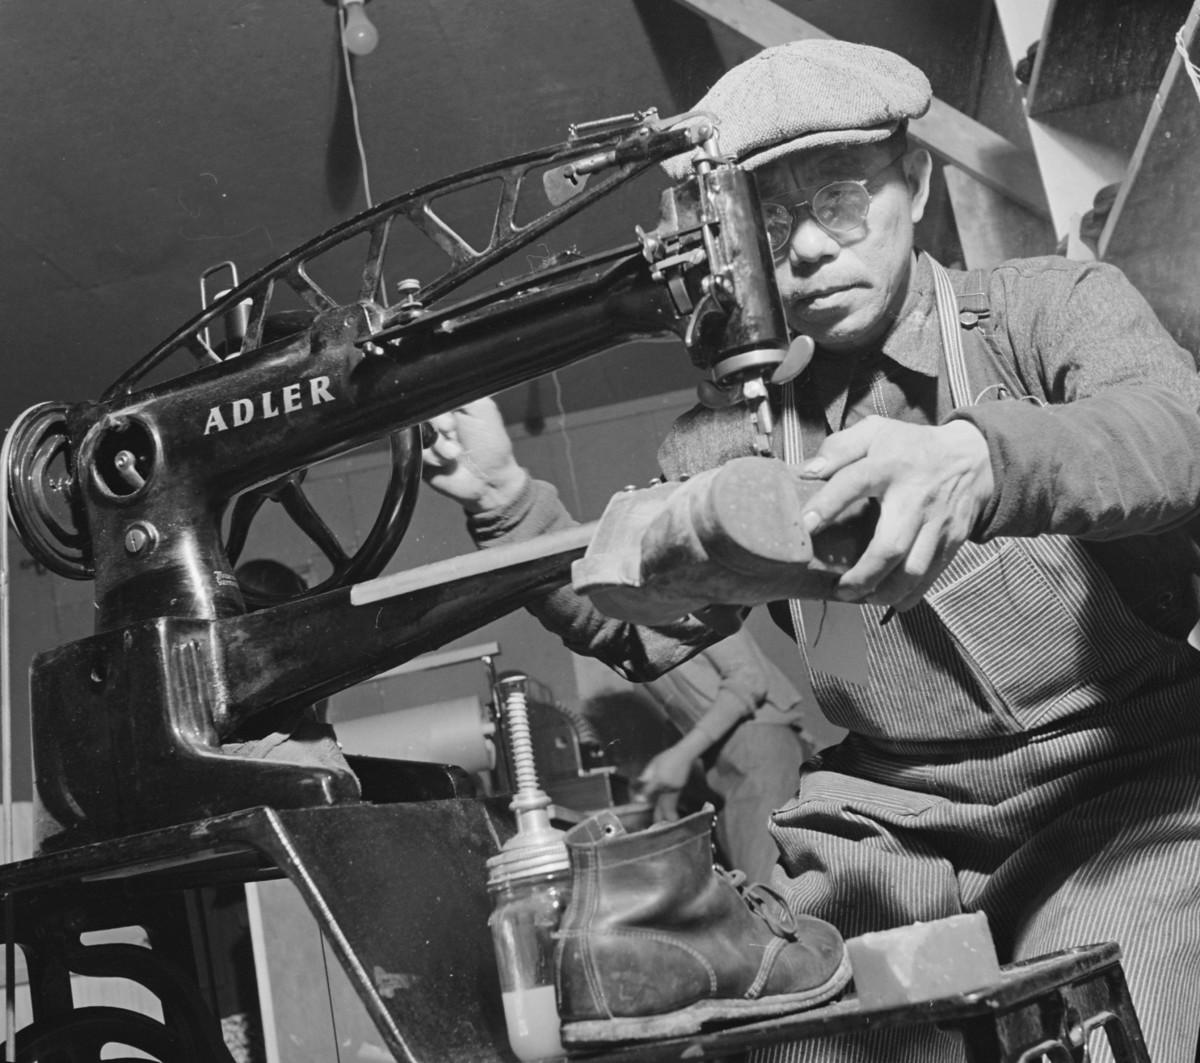 Cobbler operating a shoe stitching machine